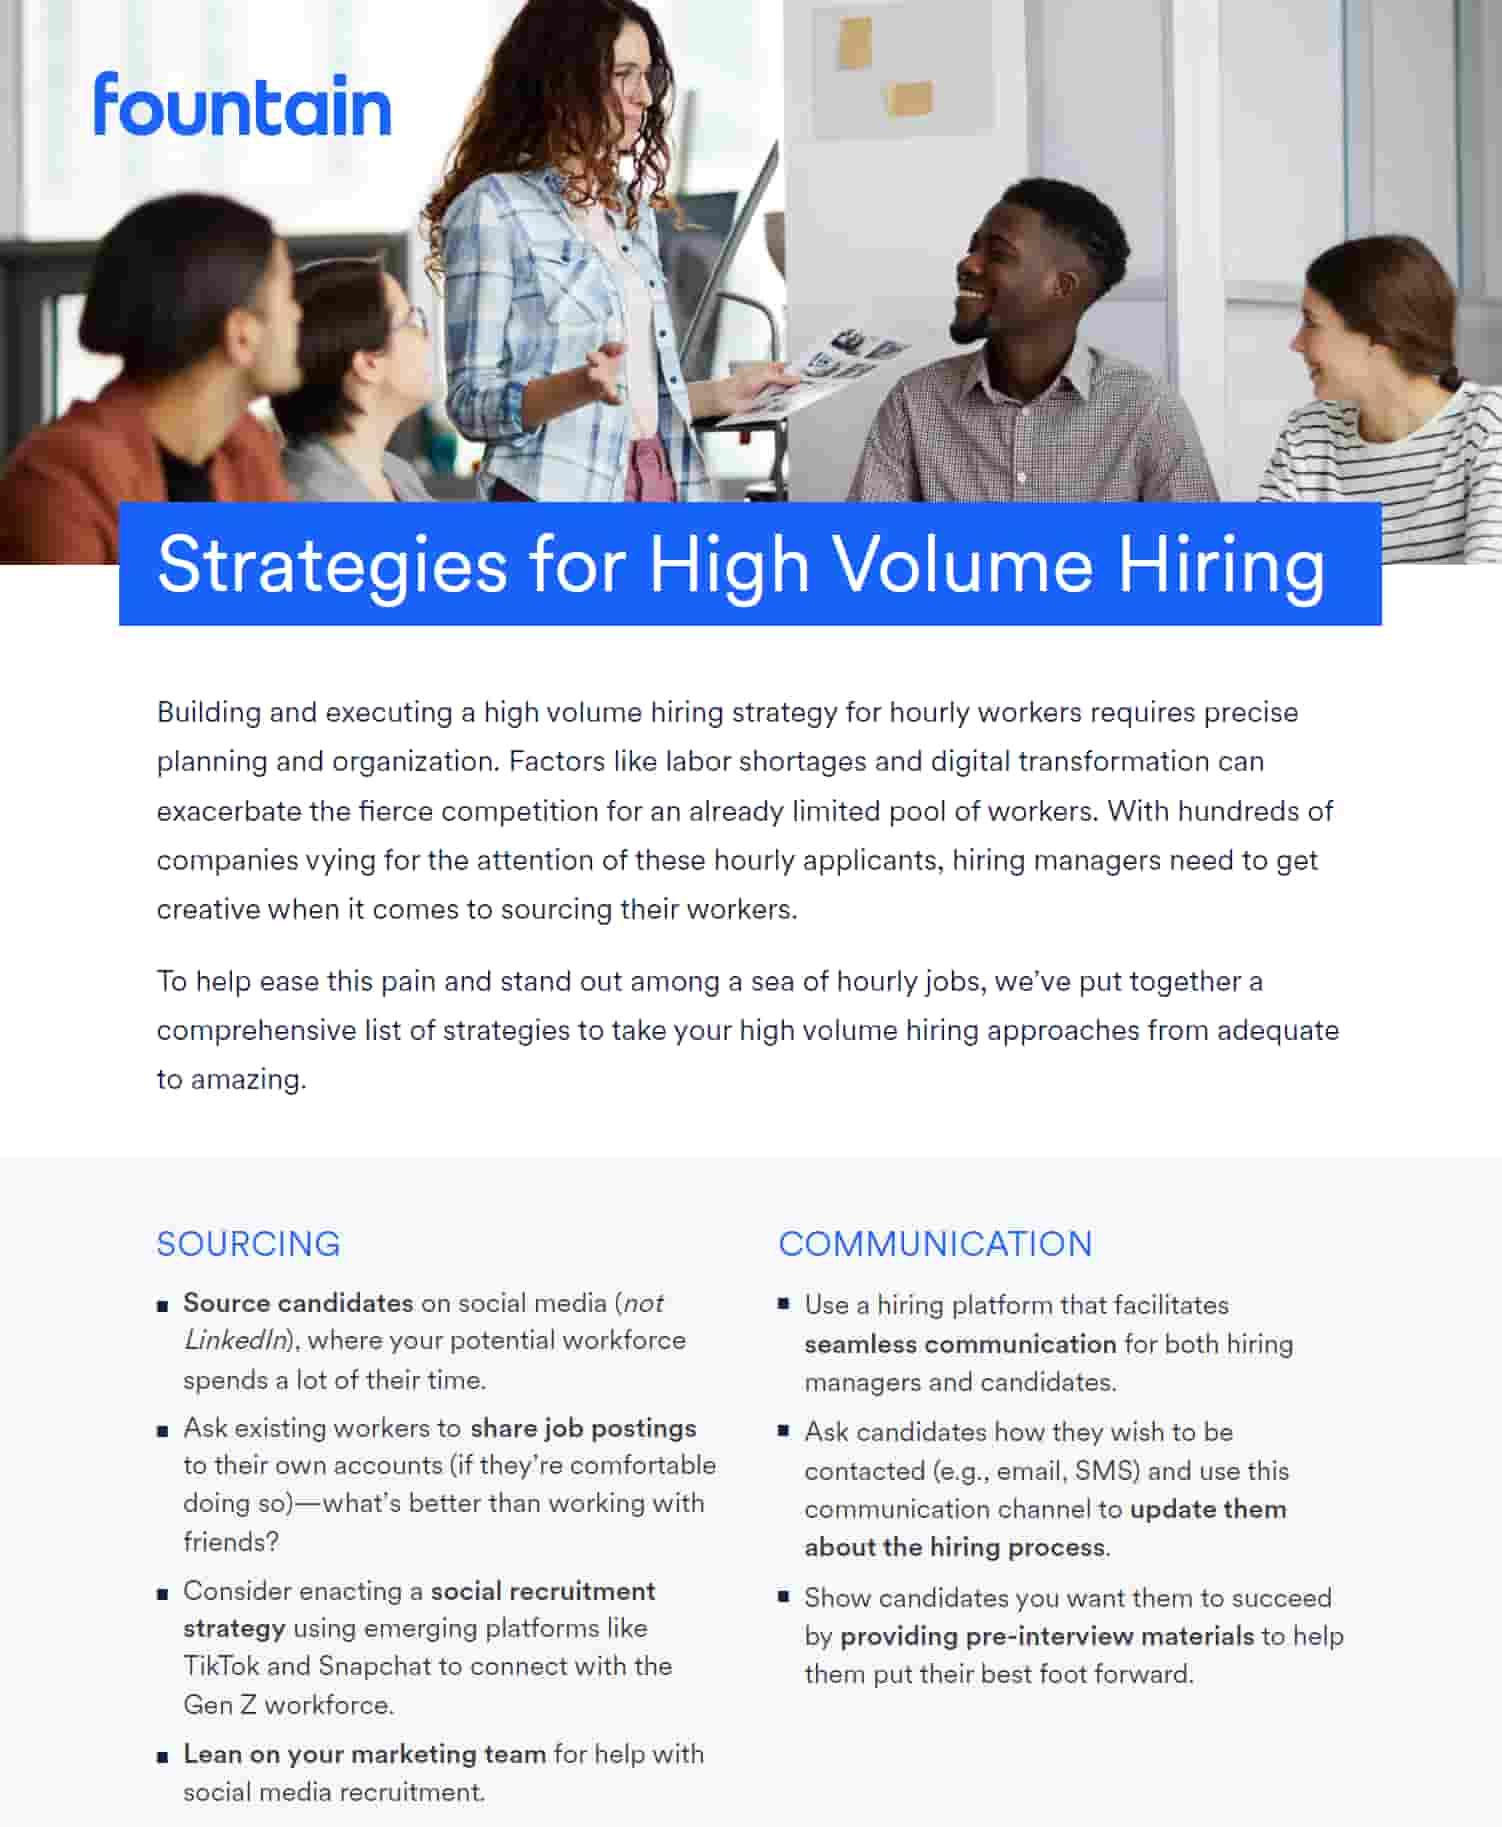 Strategies for High Volume Hiring